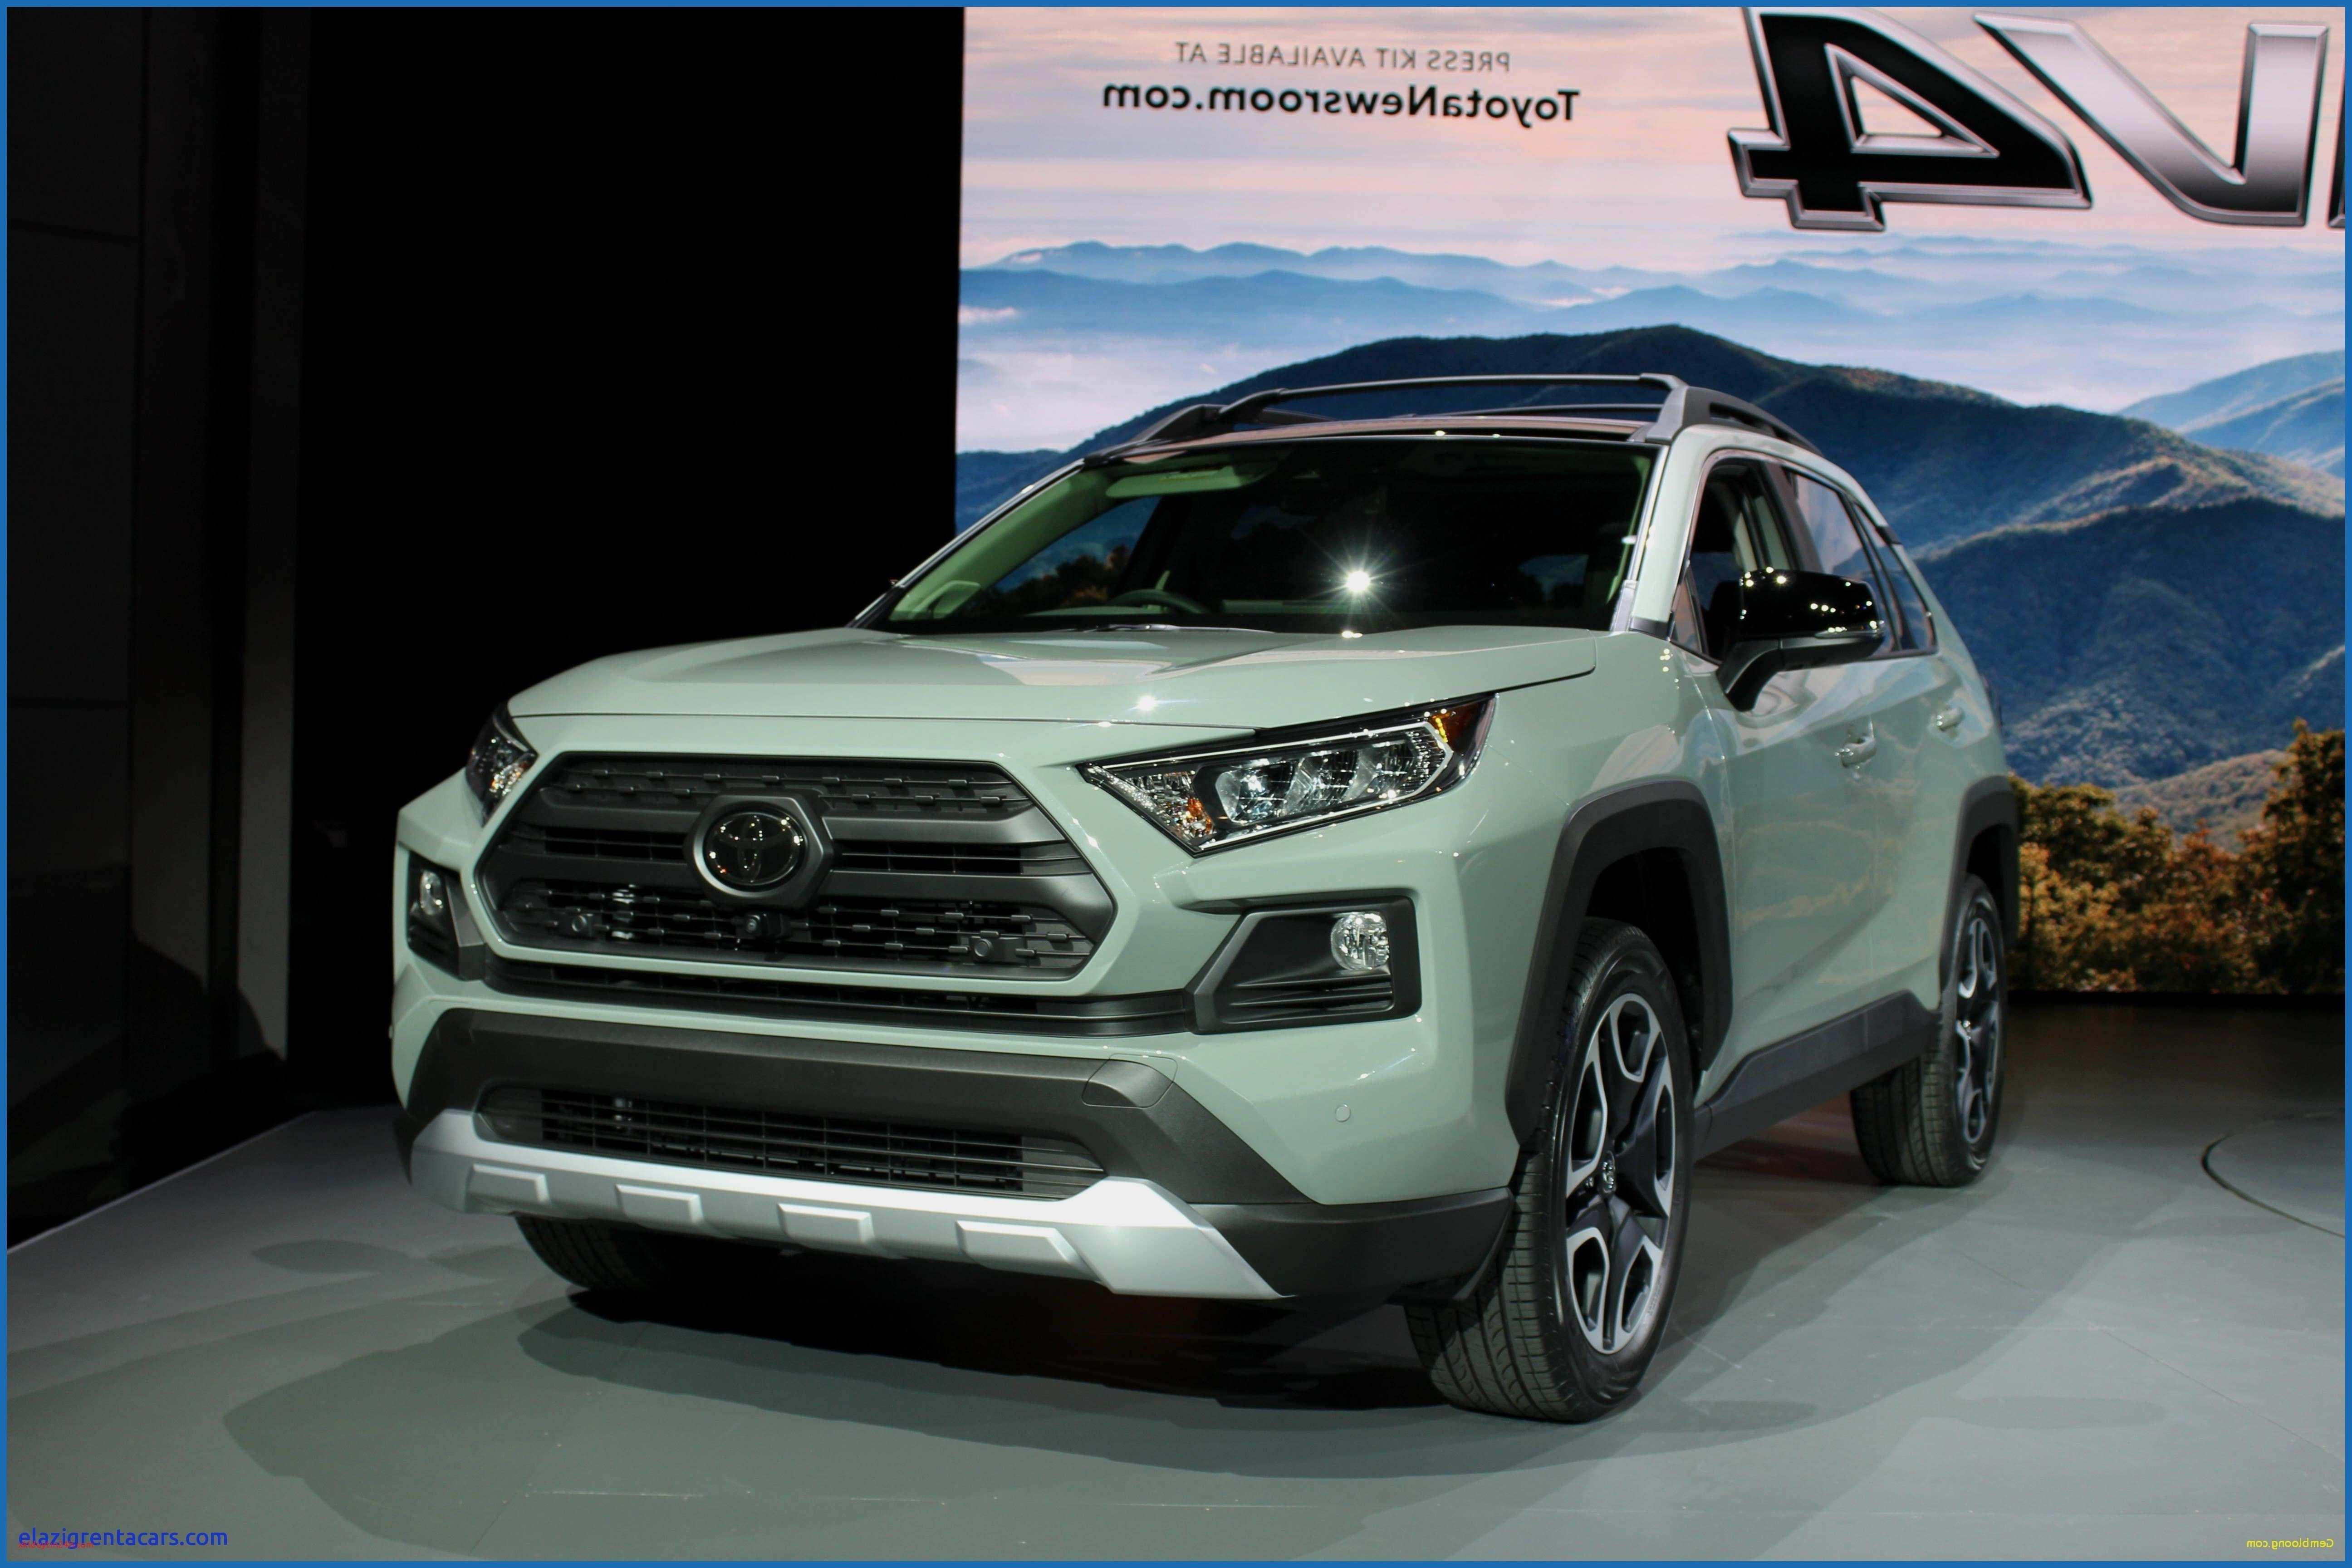 92 Gallery of Hyundai Starex 2020 Performance and New Engine by Hyundai Starex 2020